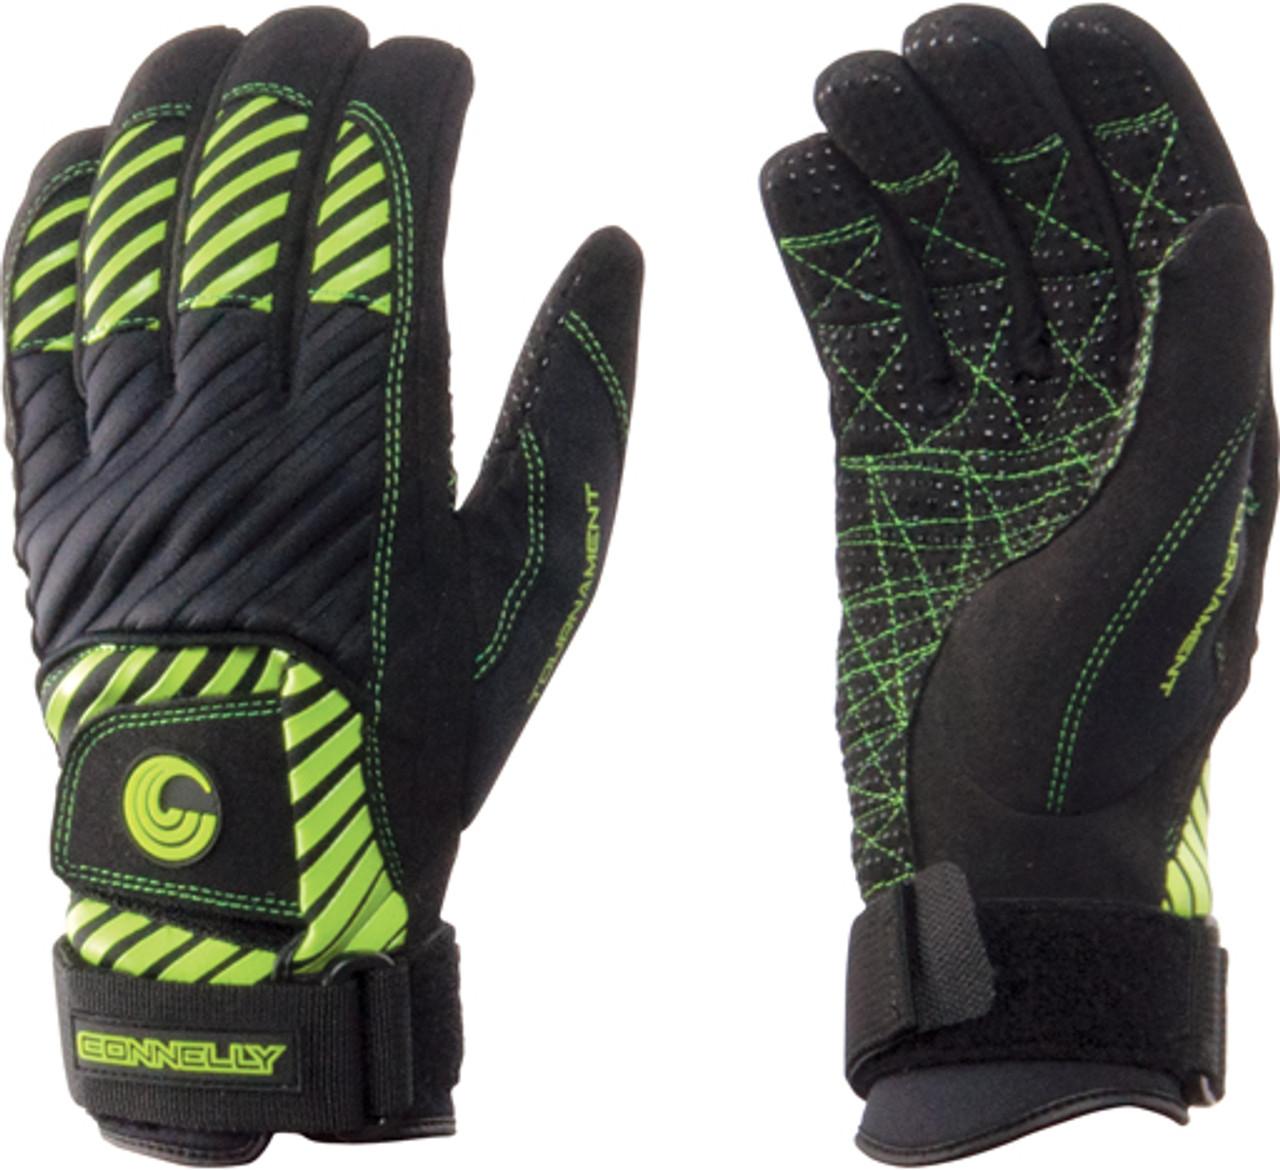 Connelly Men's Tournament Gloves